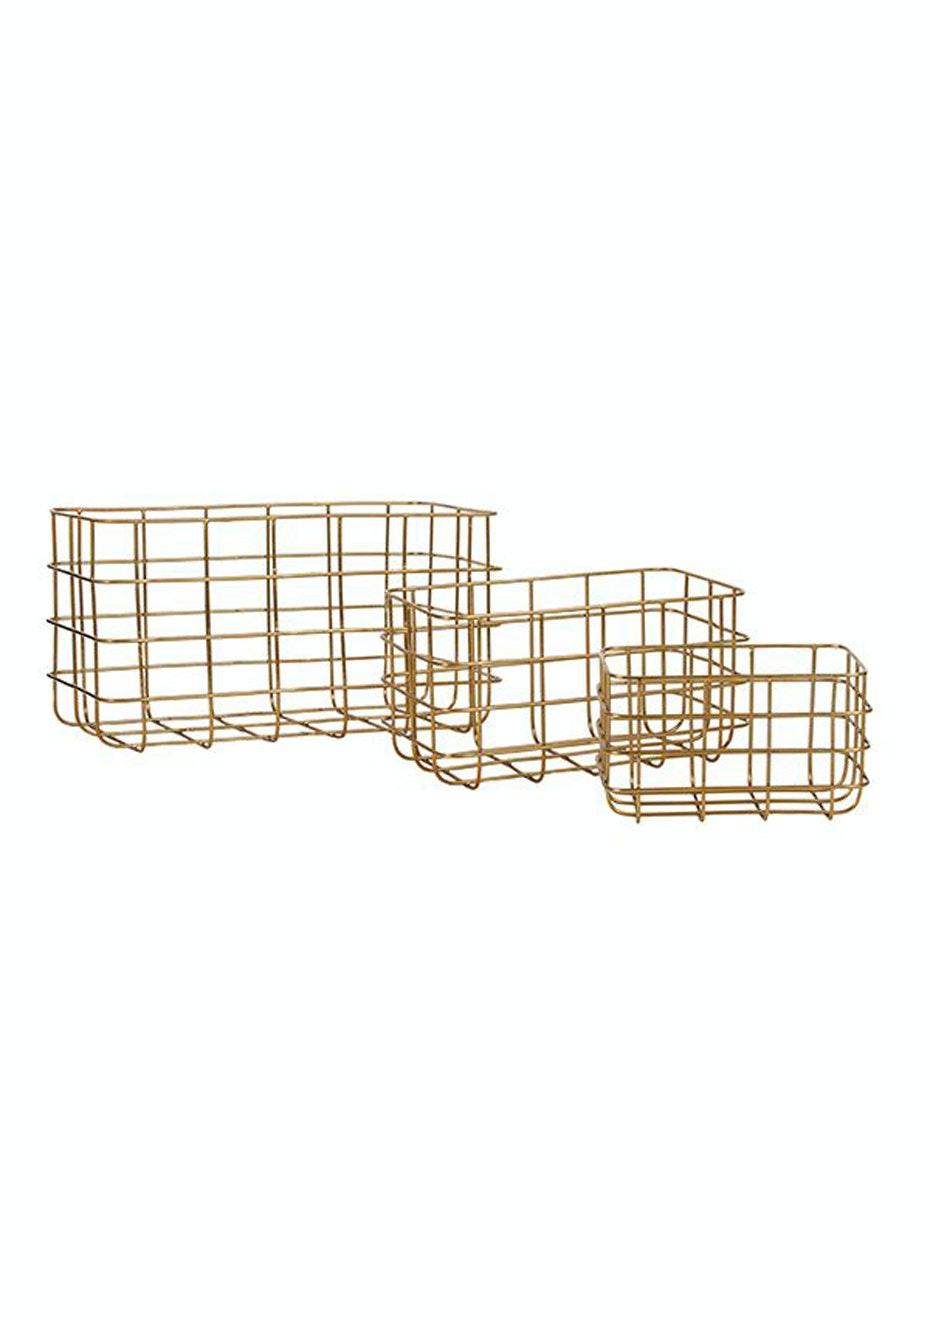 General Eclectic - Minimal Basket Brass - Set of 3